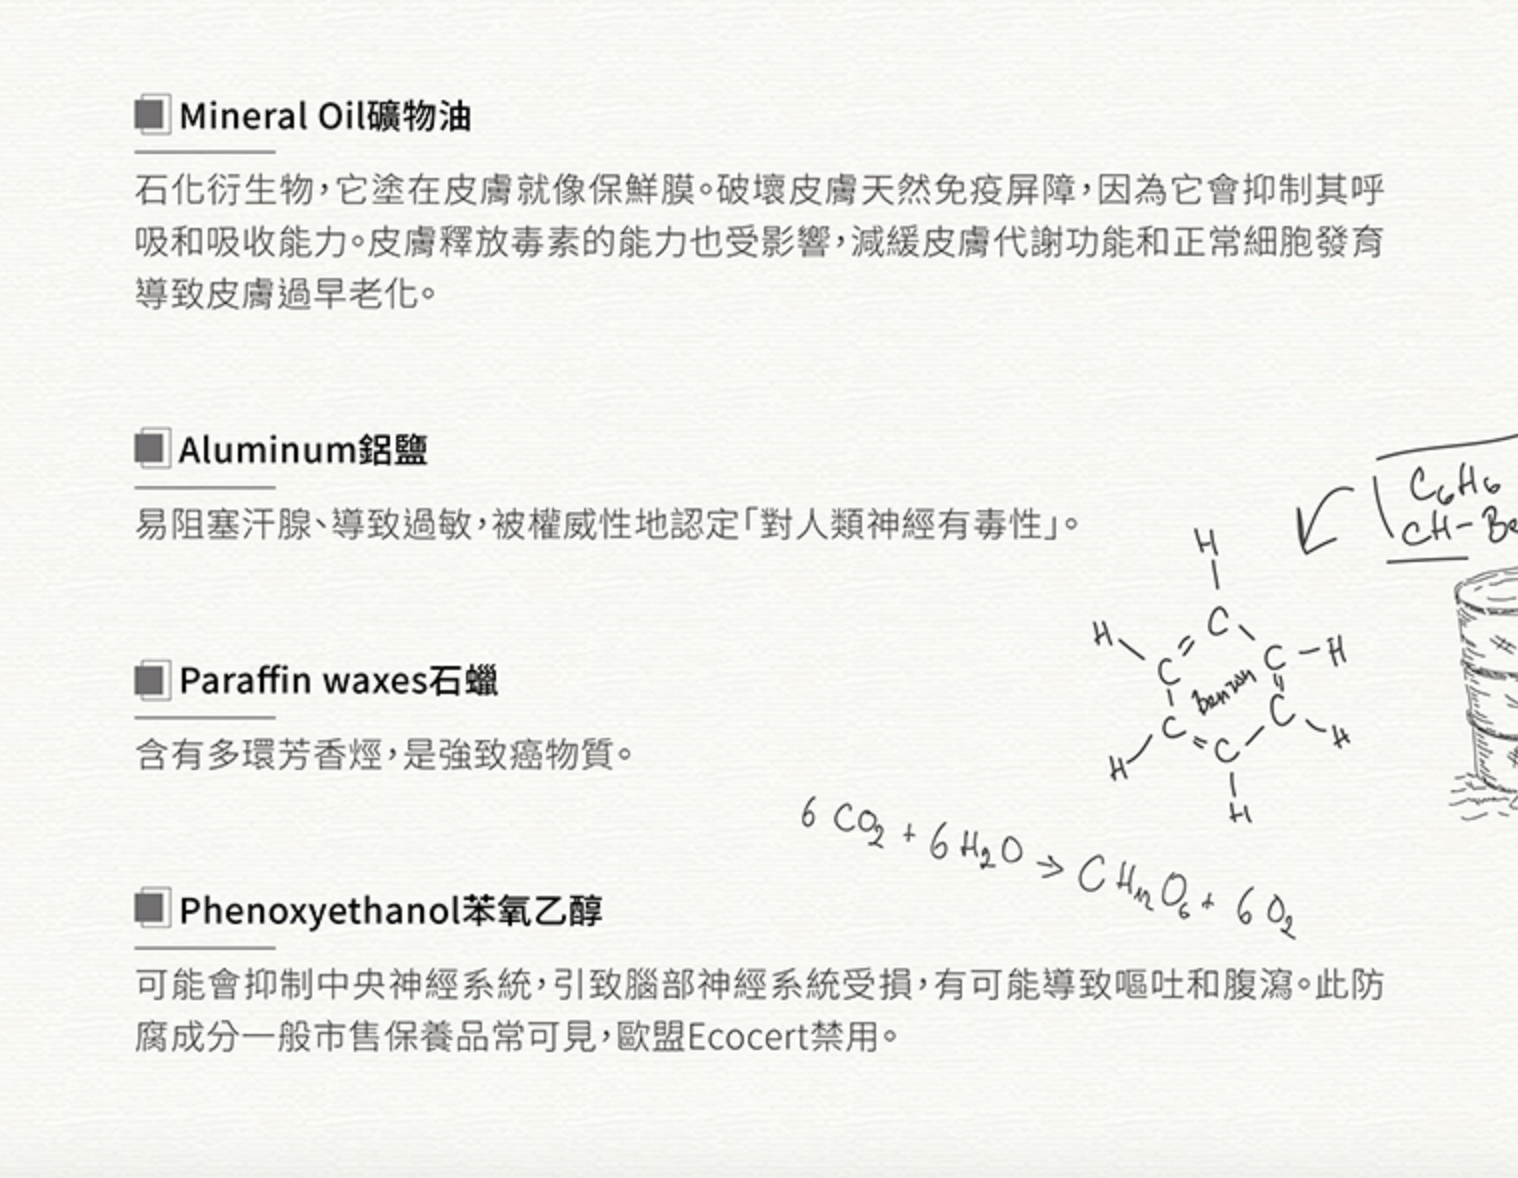 ZOOCCi質物系禁用成分(續)